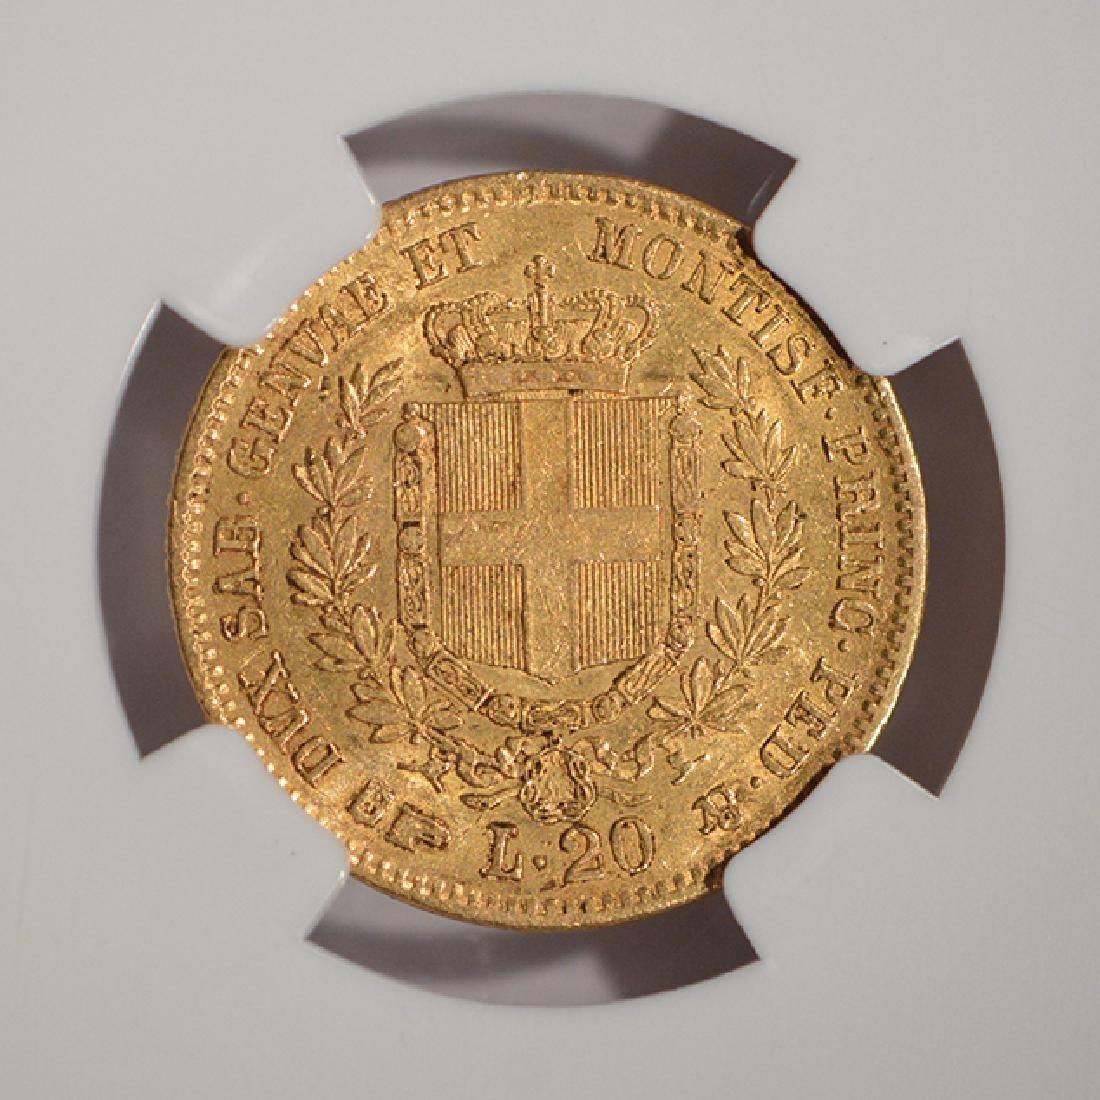 1857 Eagle B Italy 20 Lire Gold Coin NGC AU55 - 4